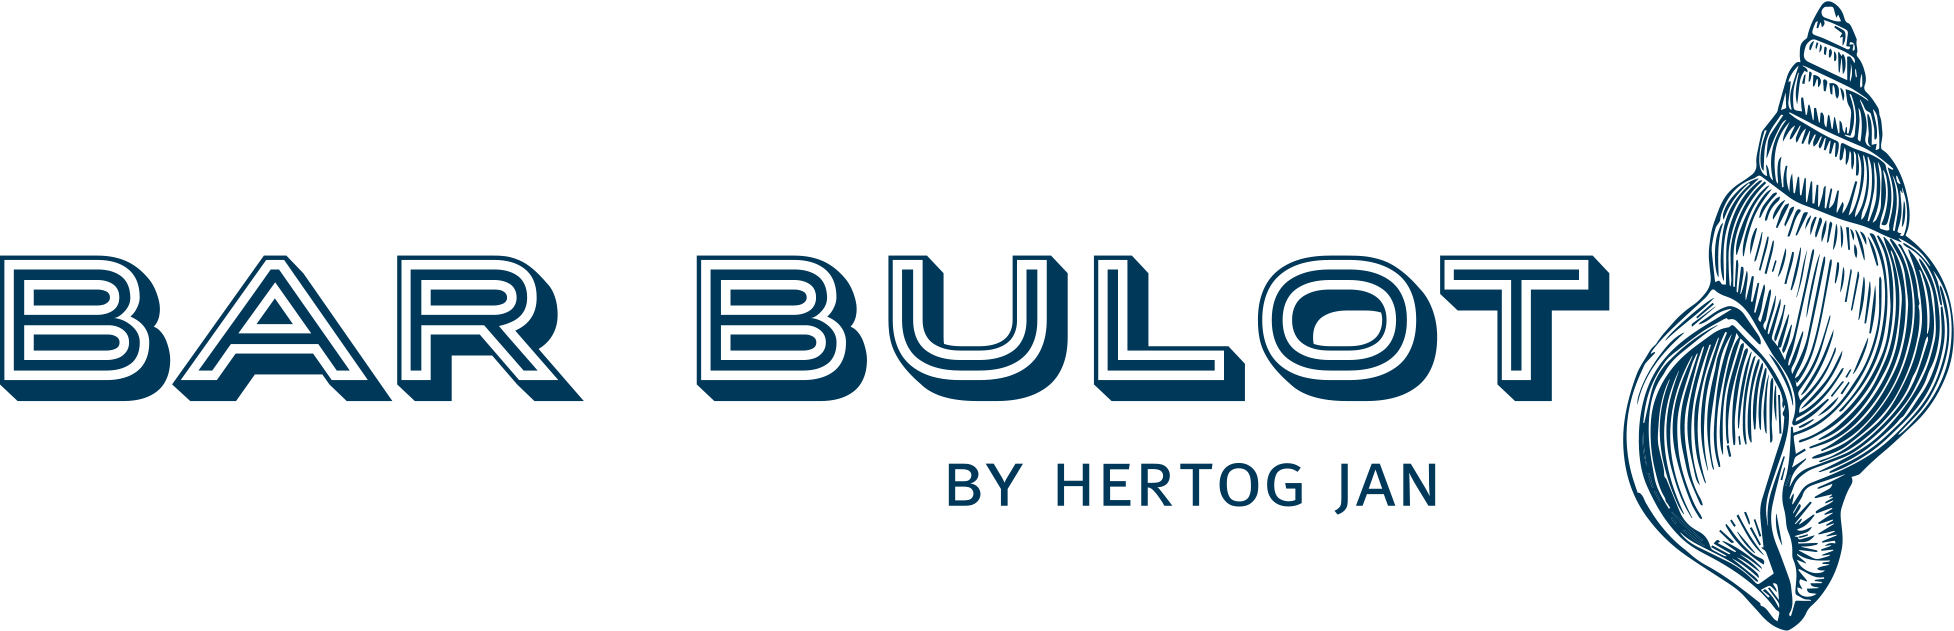 logo Bar Bulot by Hertog Jan